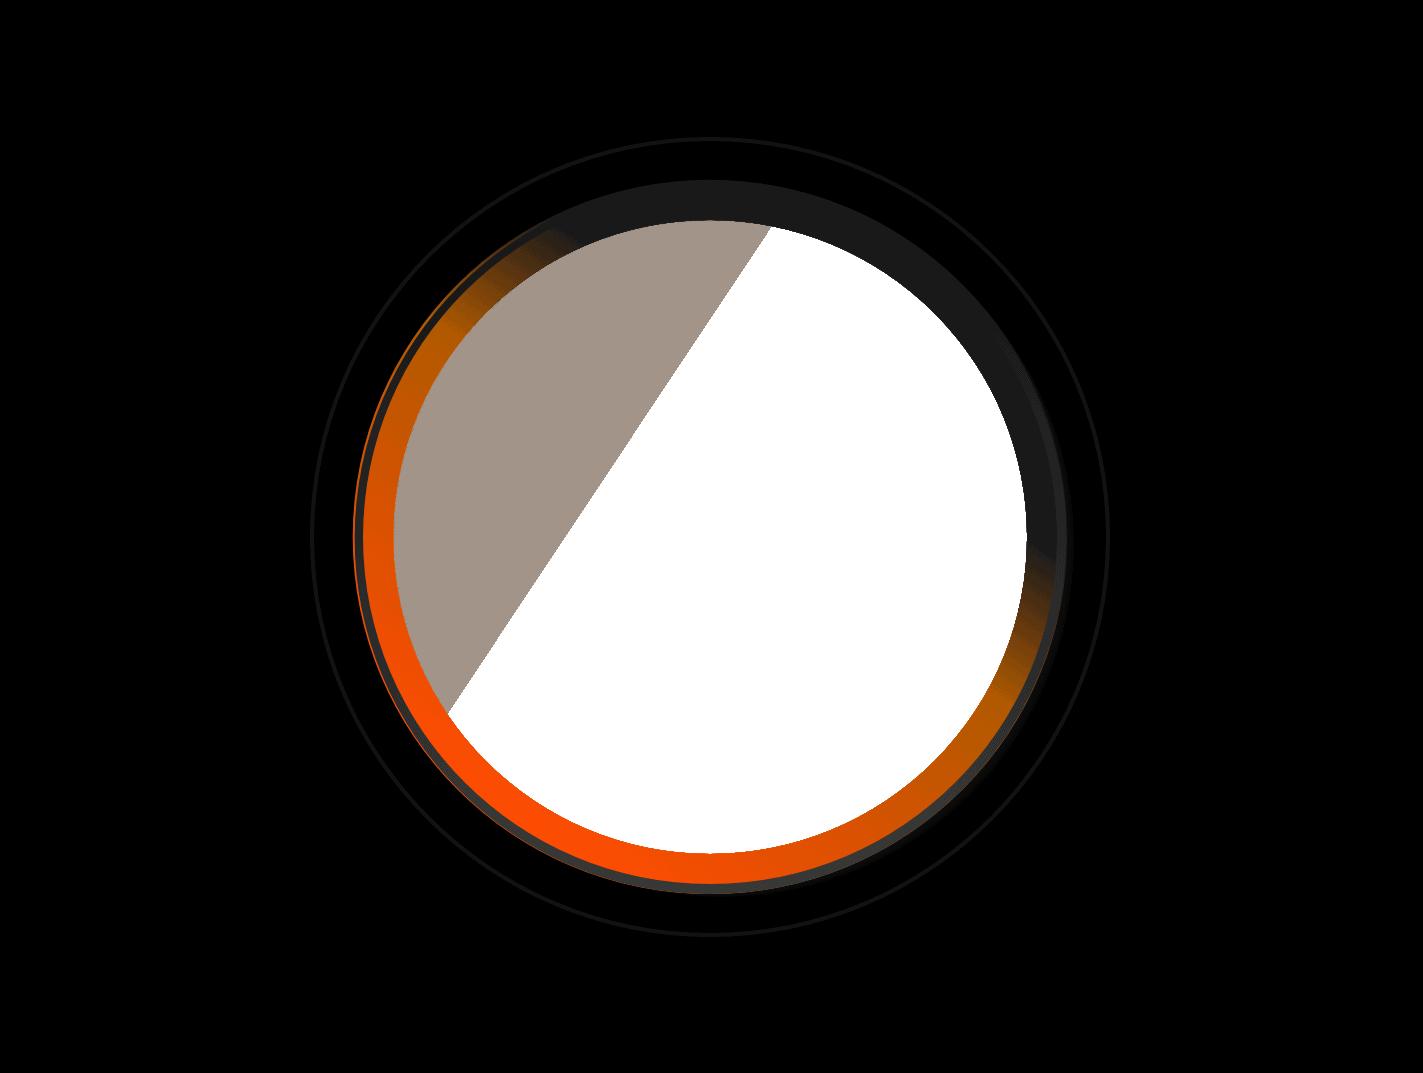 port-hole_desktopv2